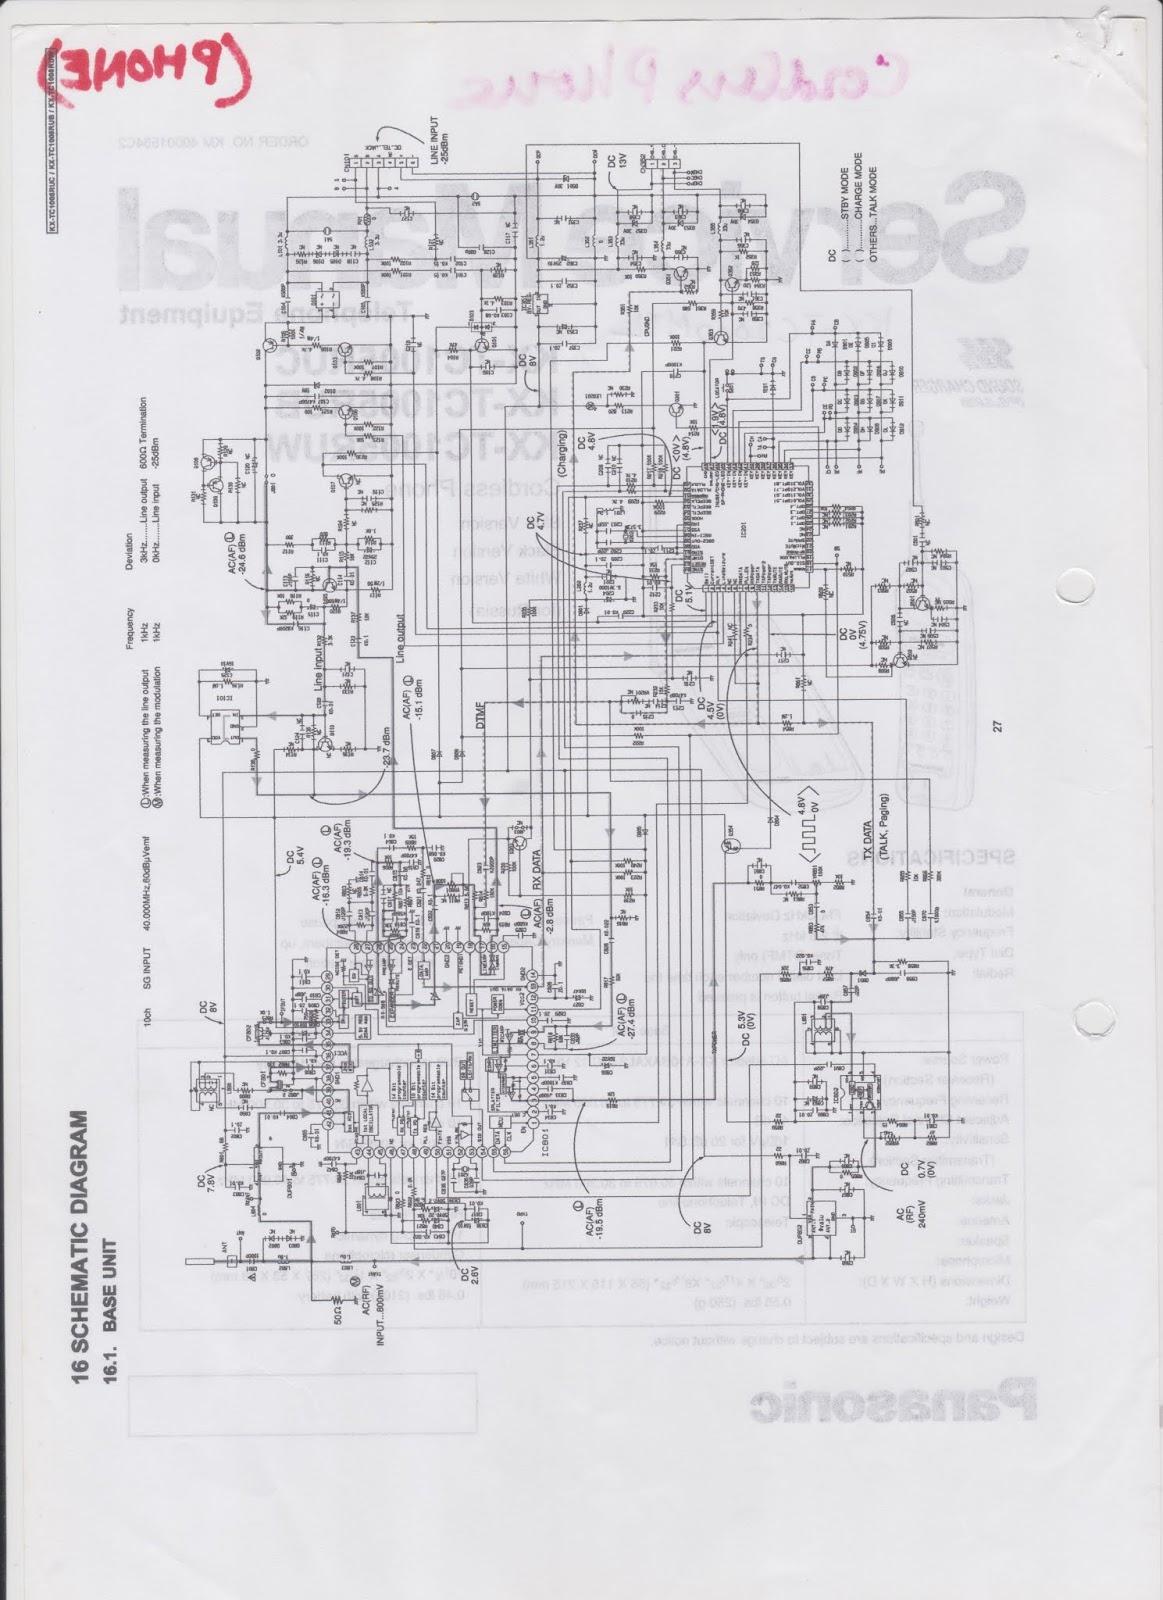 schematic diagram panasonic cordless phone